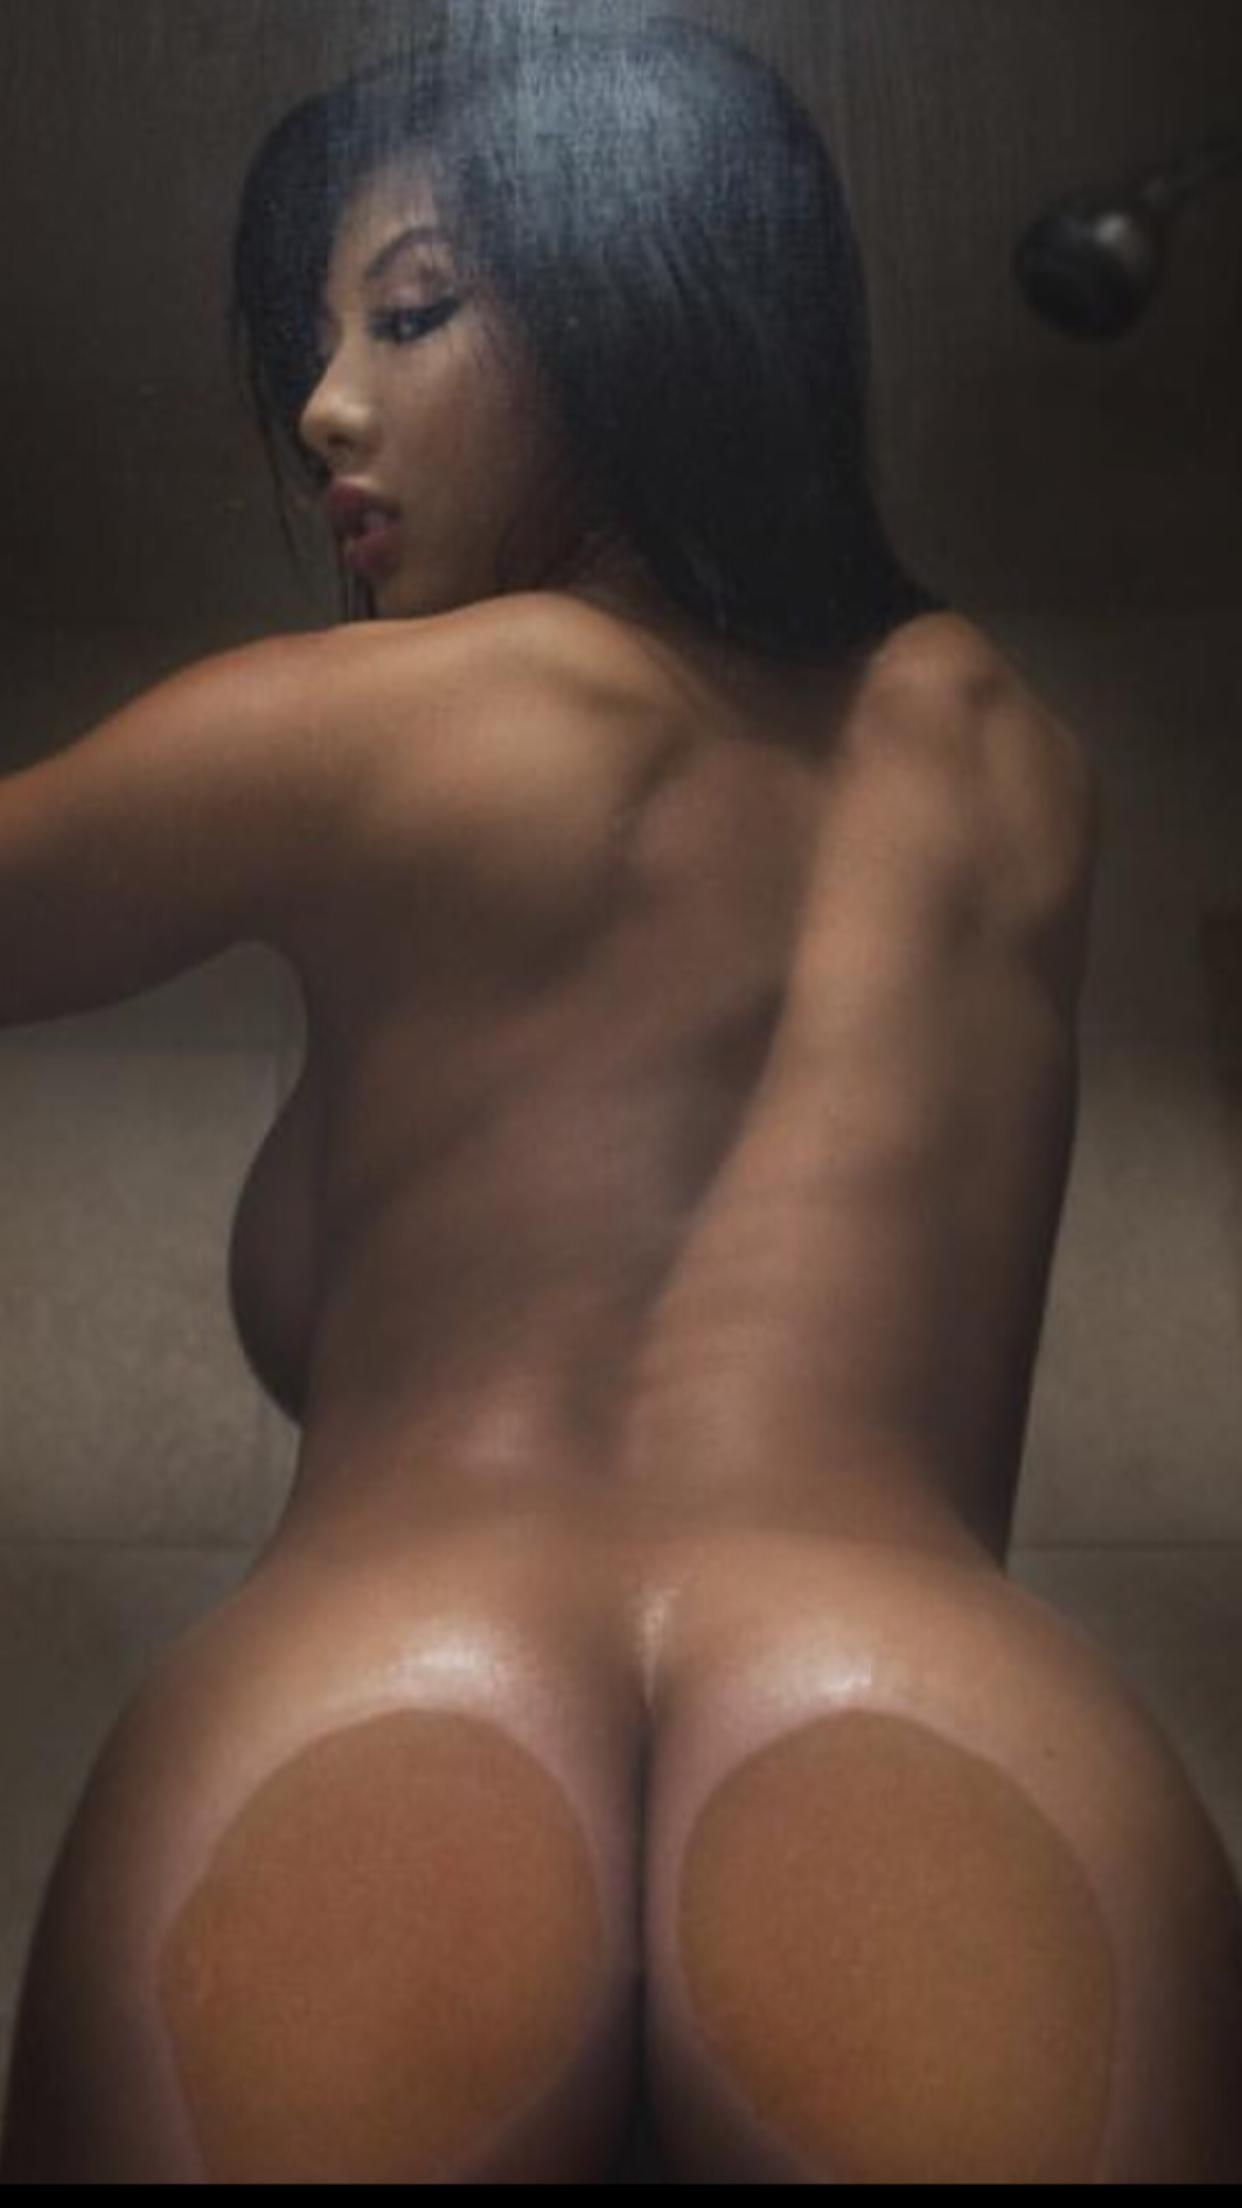 Sexy white lady show off her bbc blow job skills